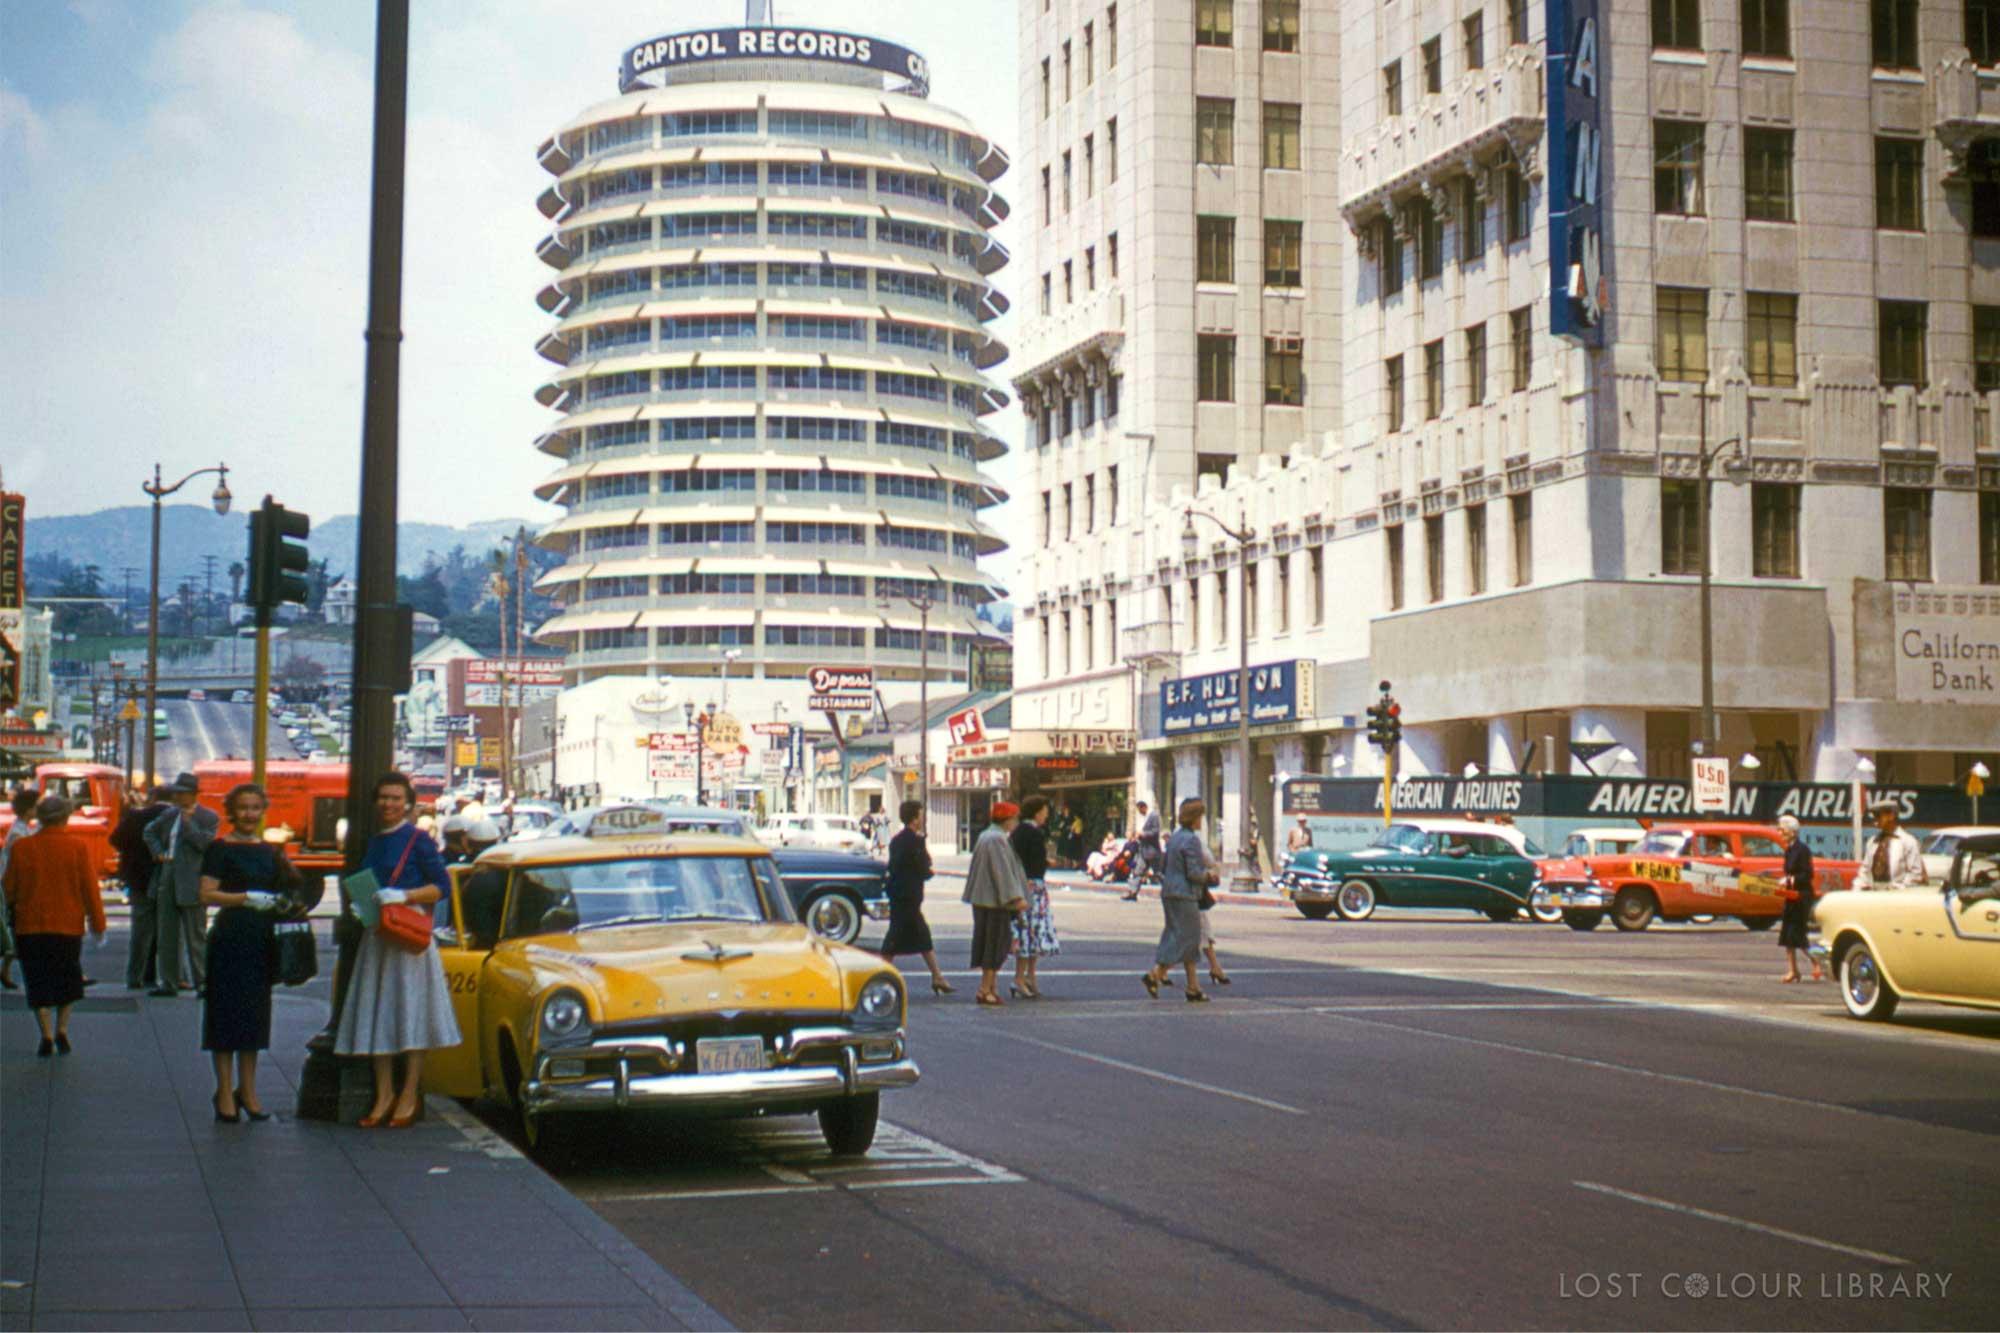 lcl-ww-capitol-building-1950s-site-wm.jpg